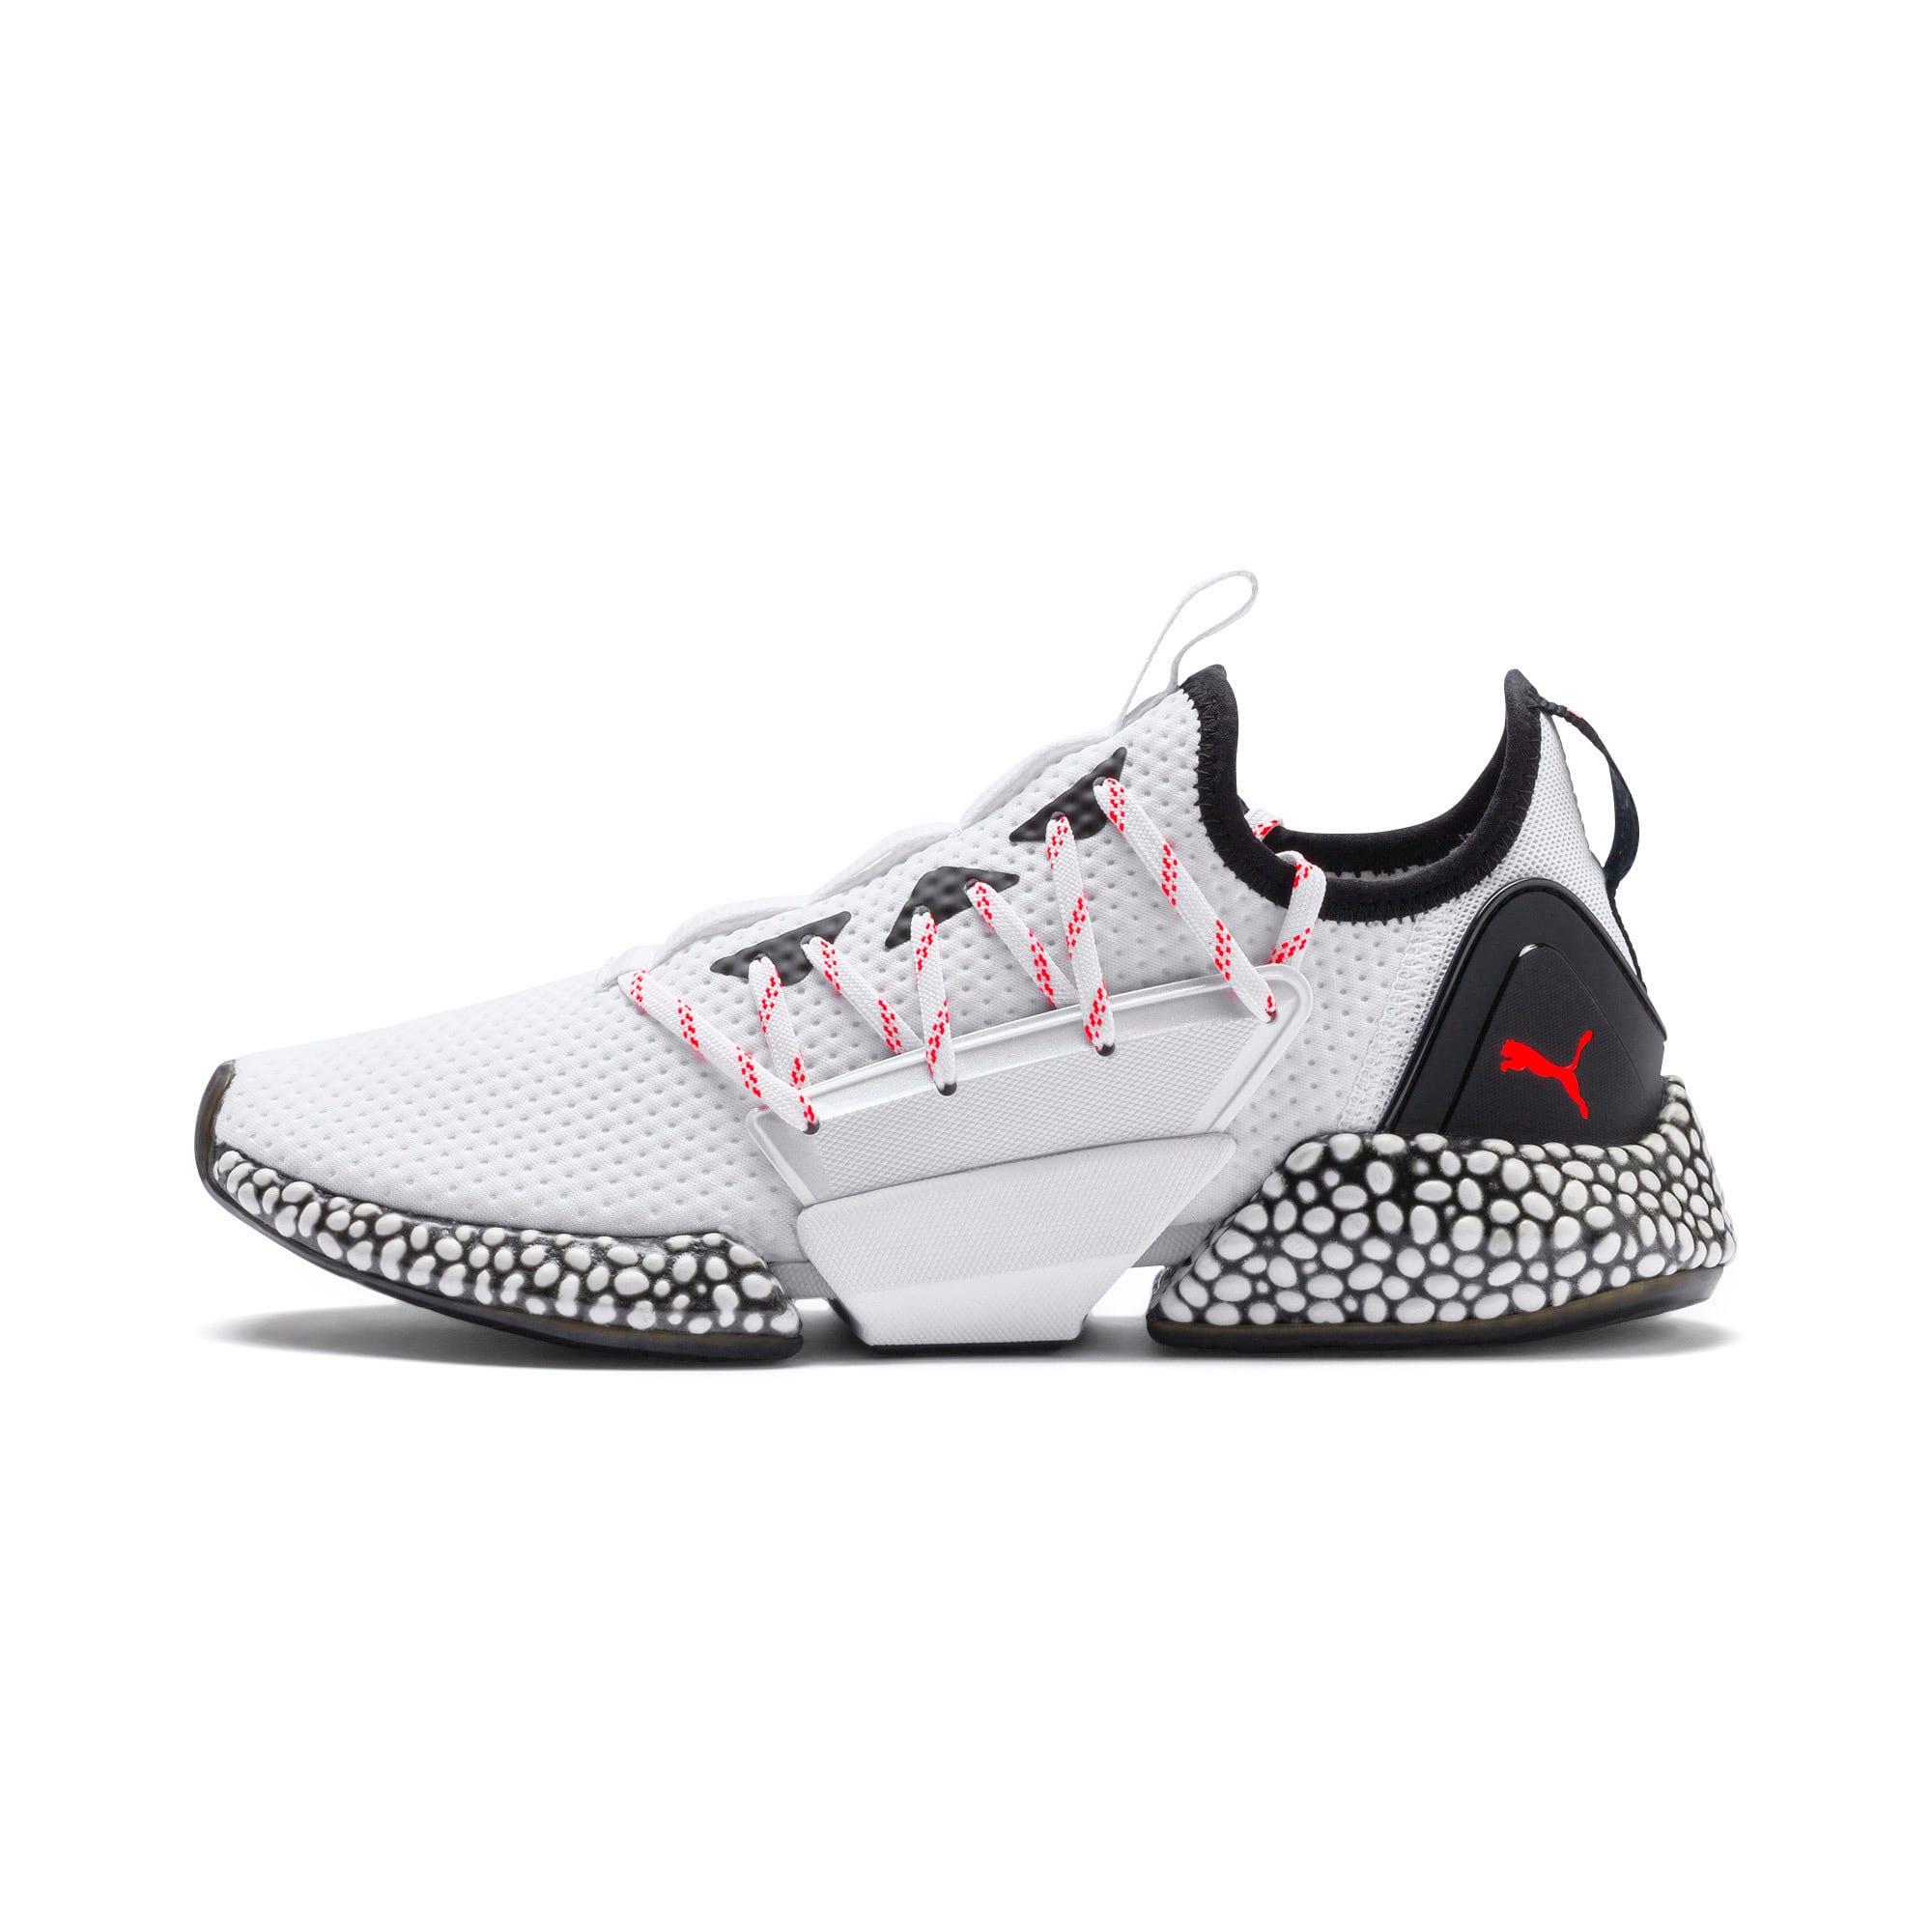 Thumbnail 1 of HYBRID Rocket Aero Men's Sneakers, Puma White-Puma Black, medium